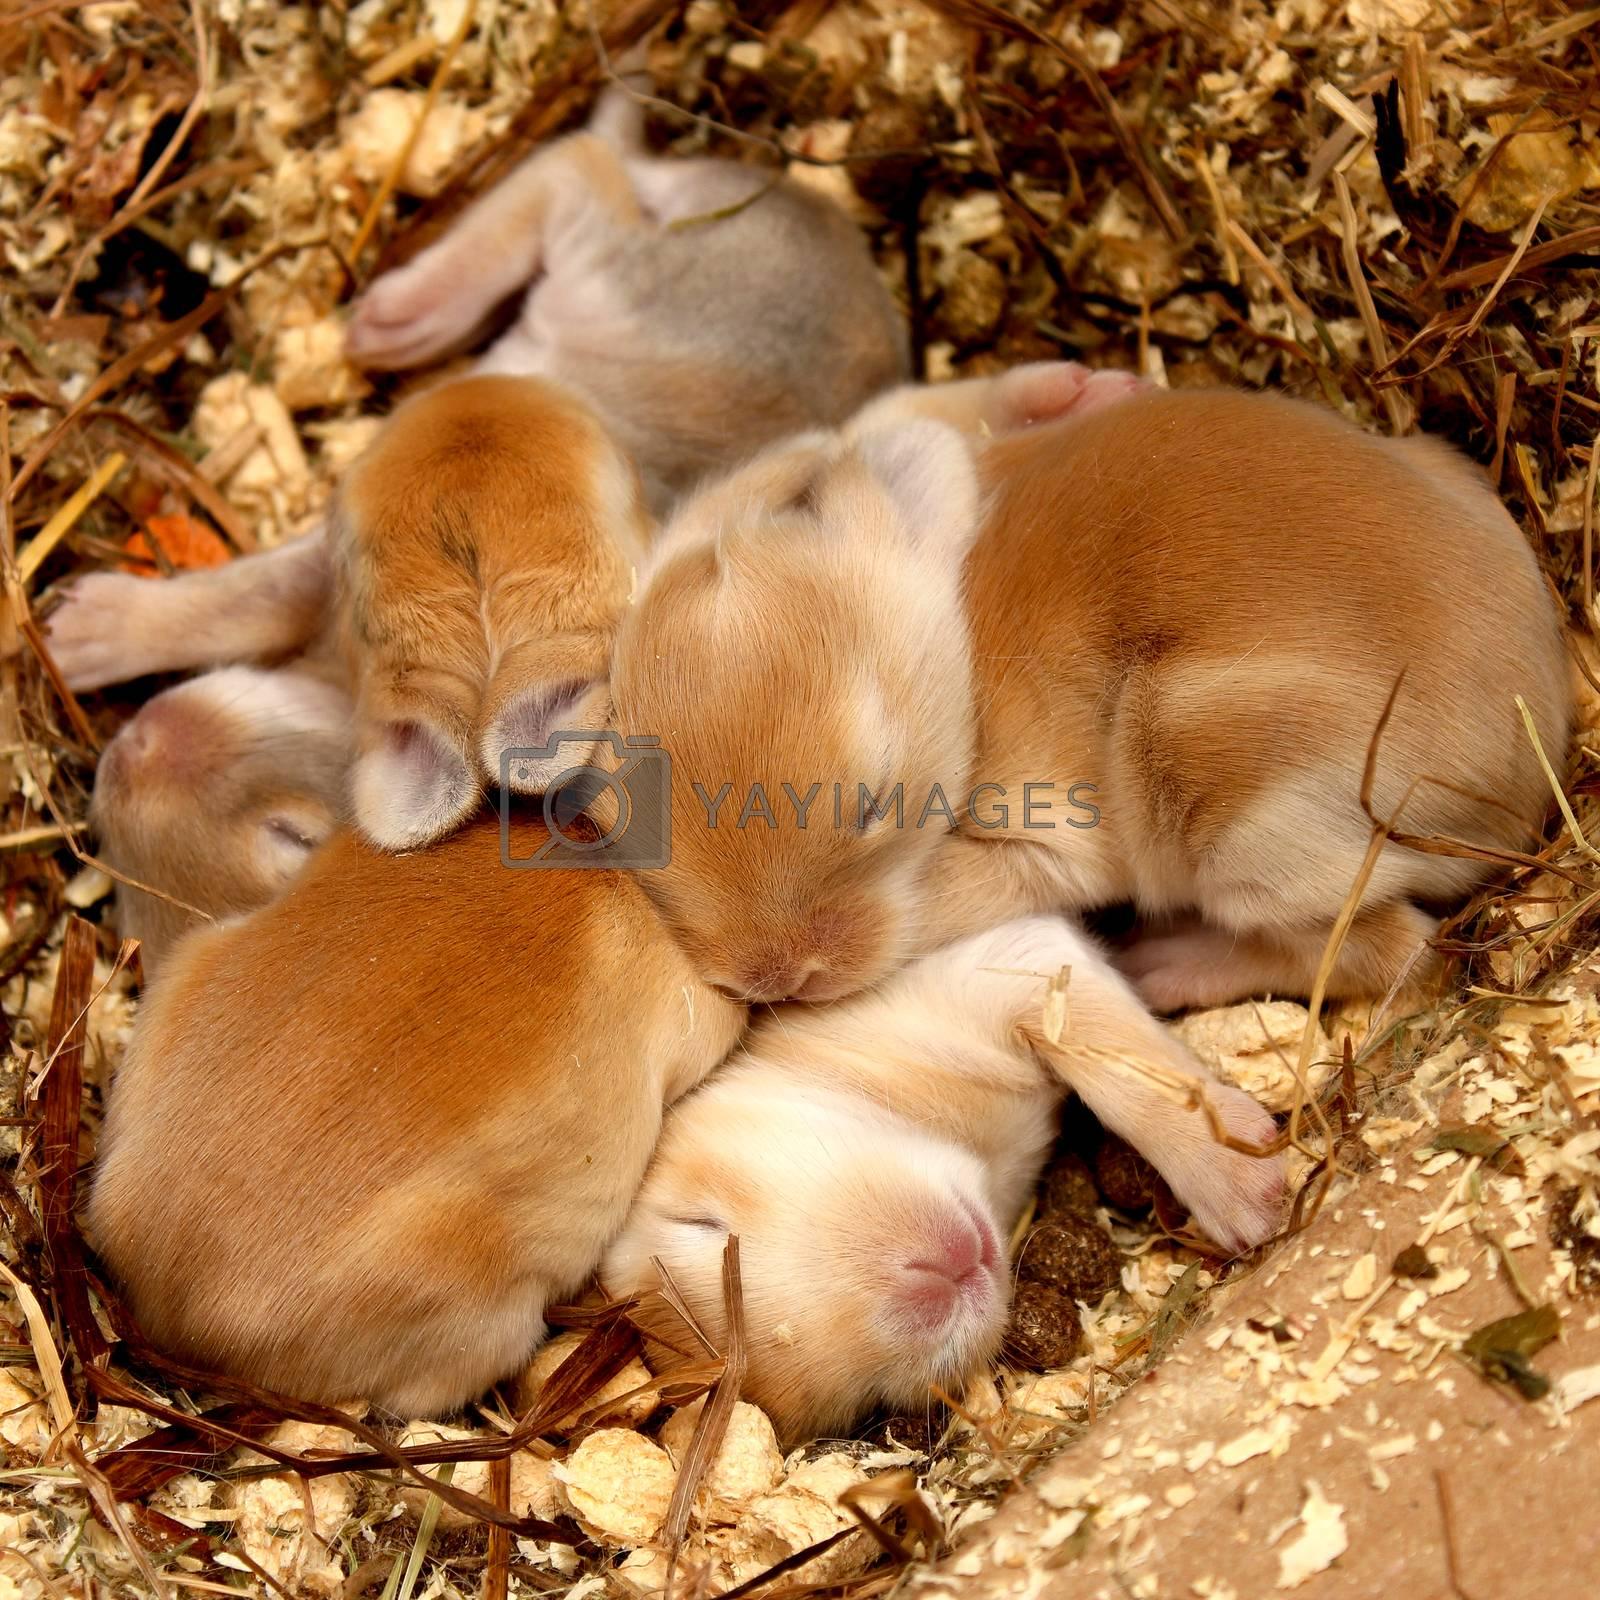 Little rabbit babies sleeping together. Cute pets